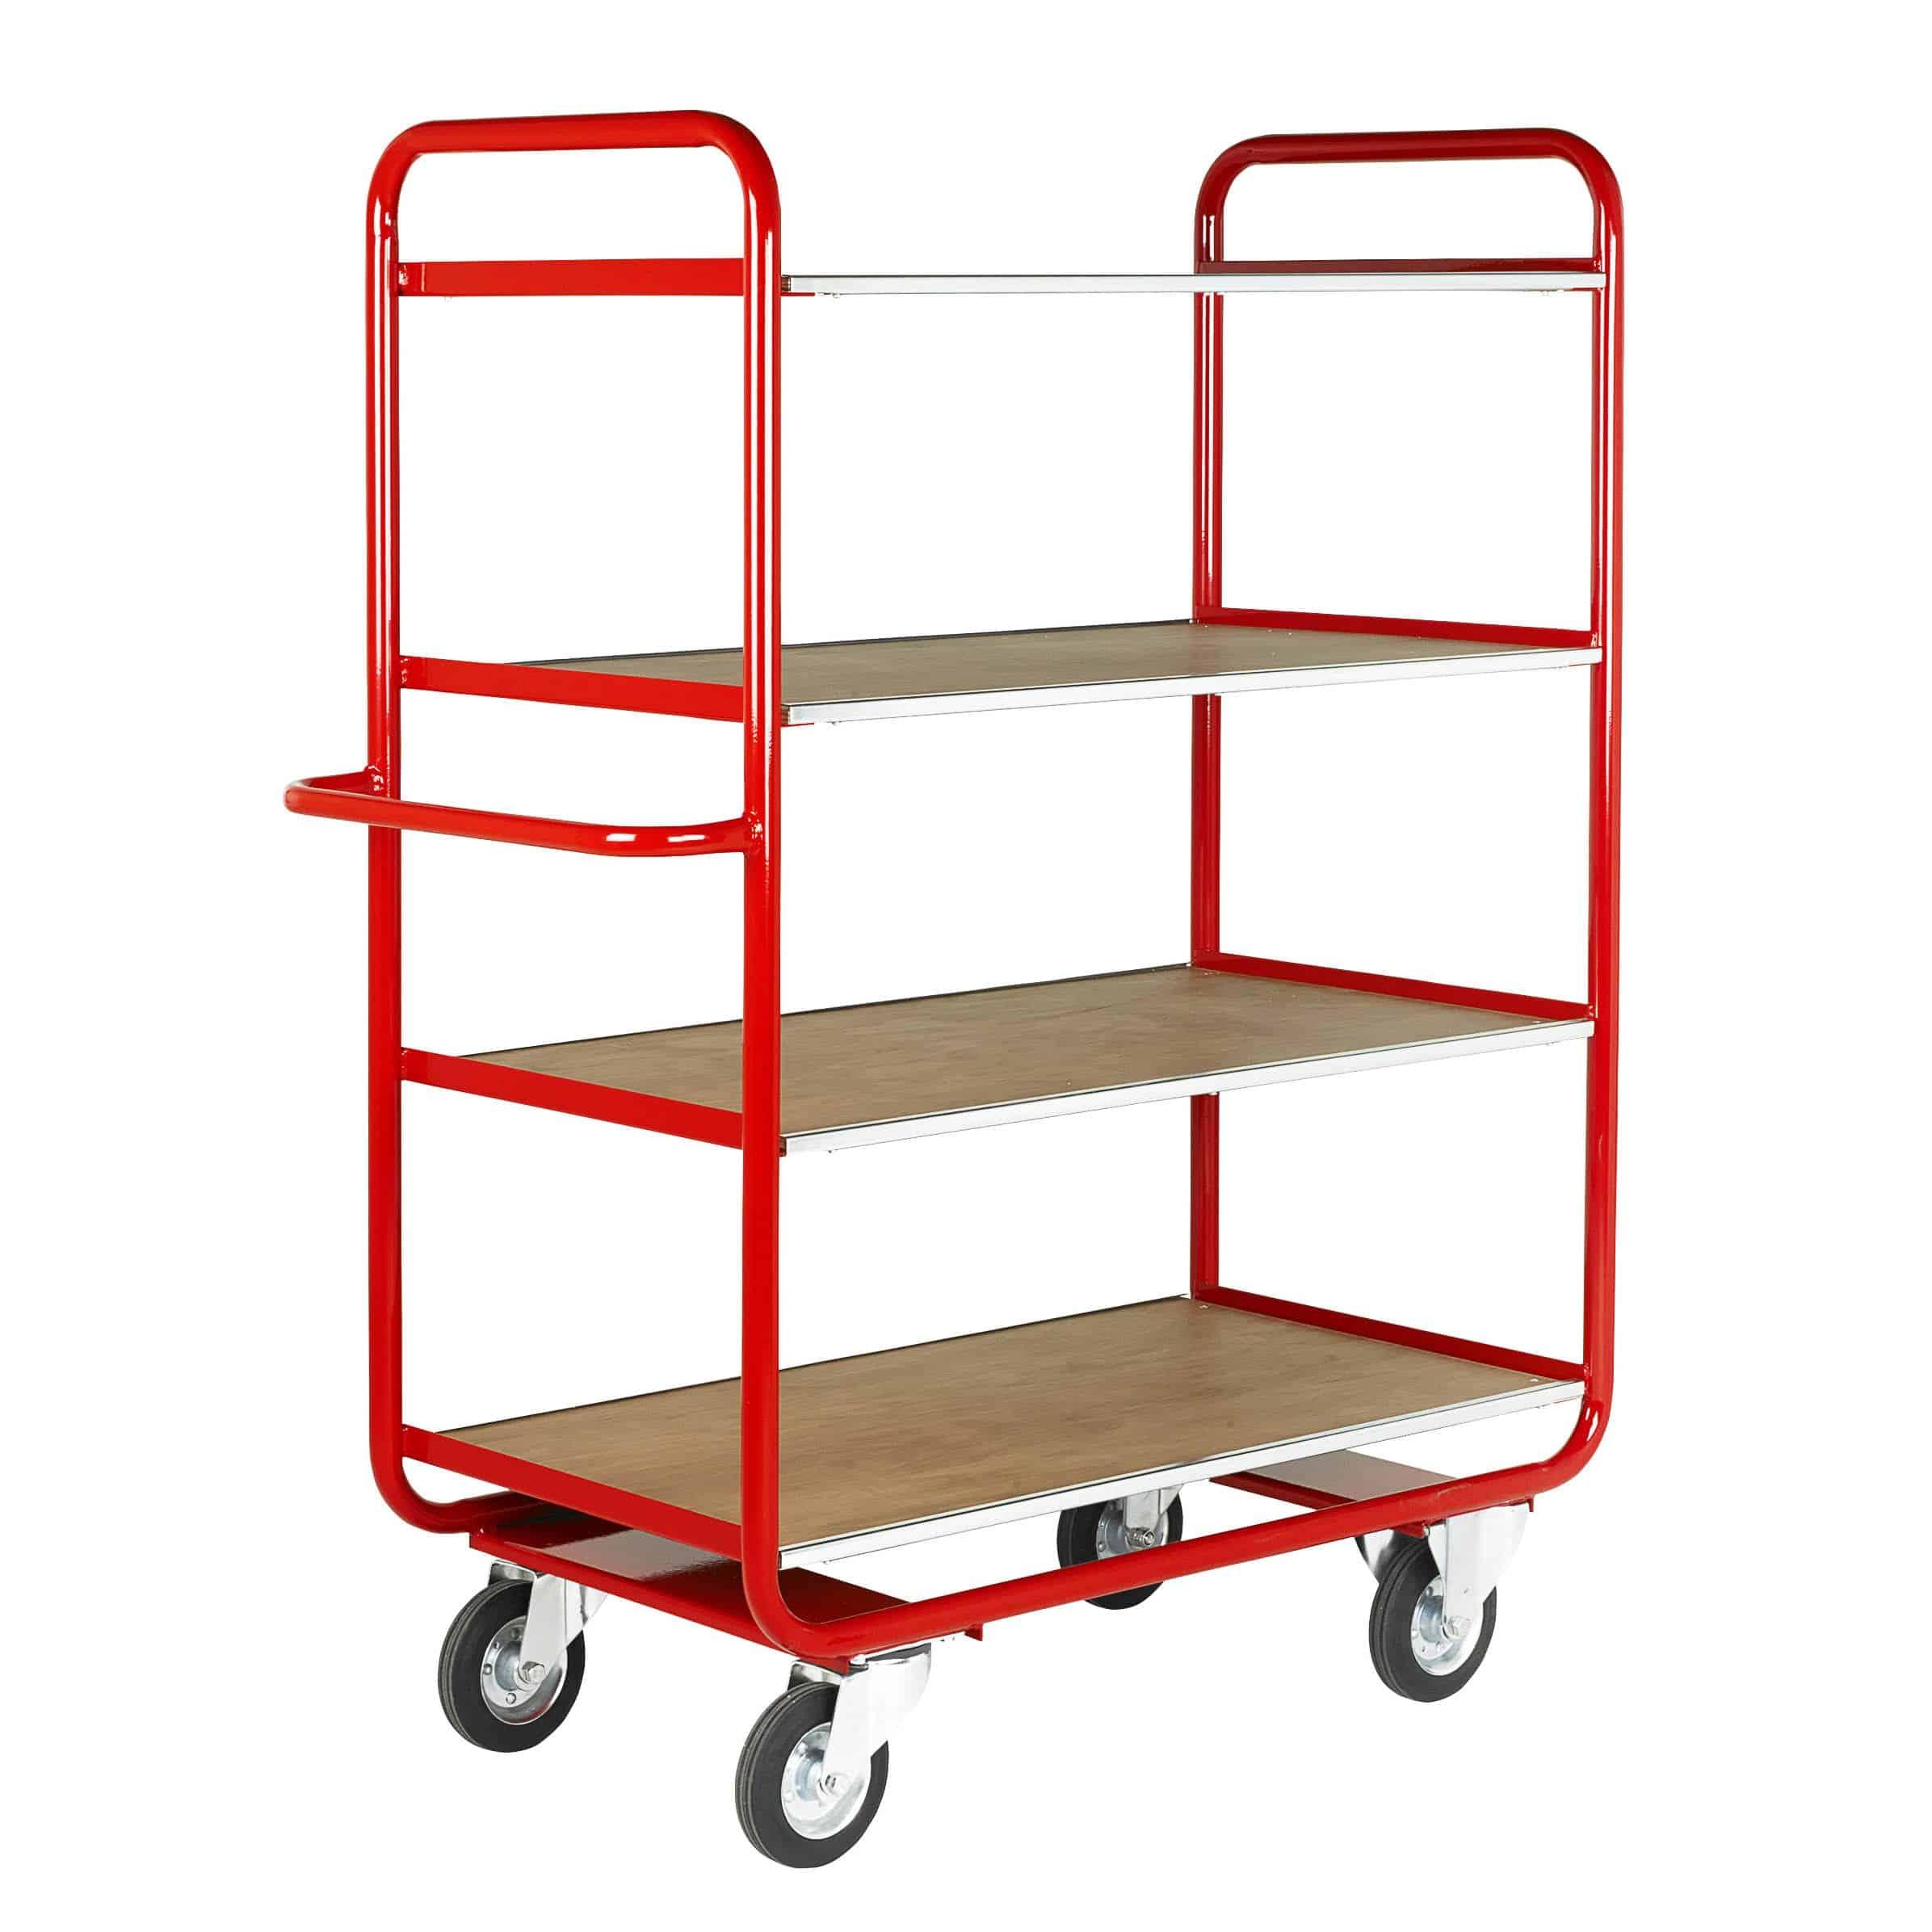 Fixed Timber 4 Deck Shelf Trucks